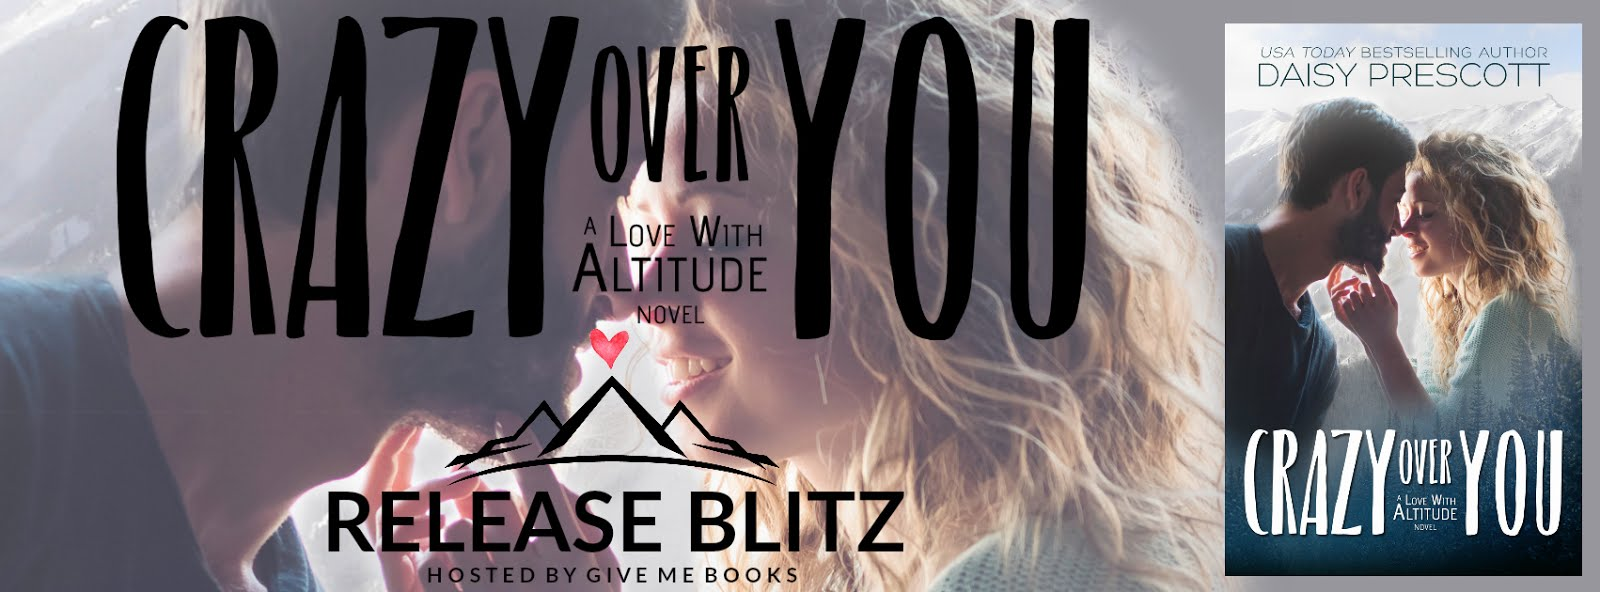 Crazy Over You Release Blitz